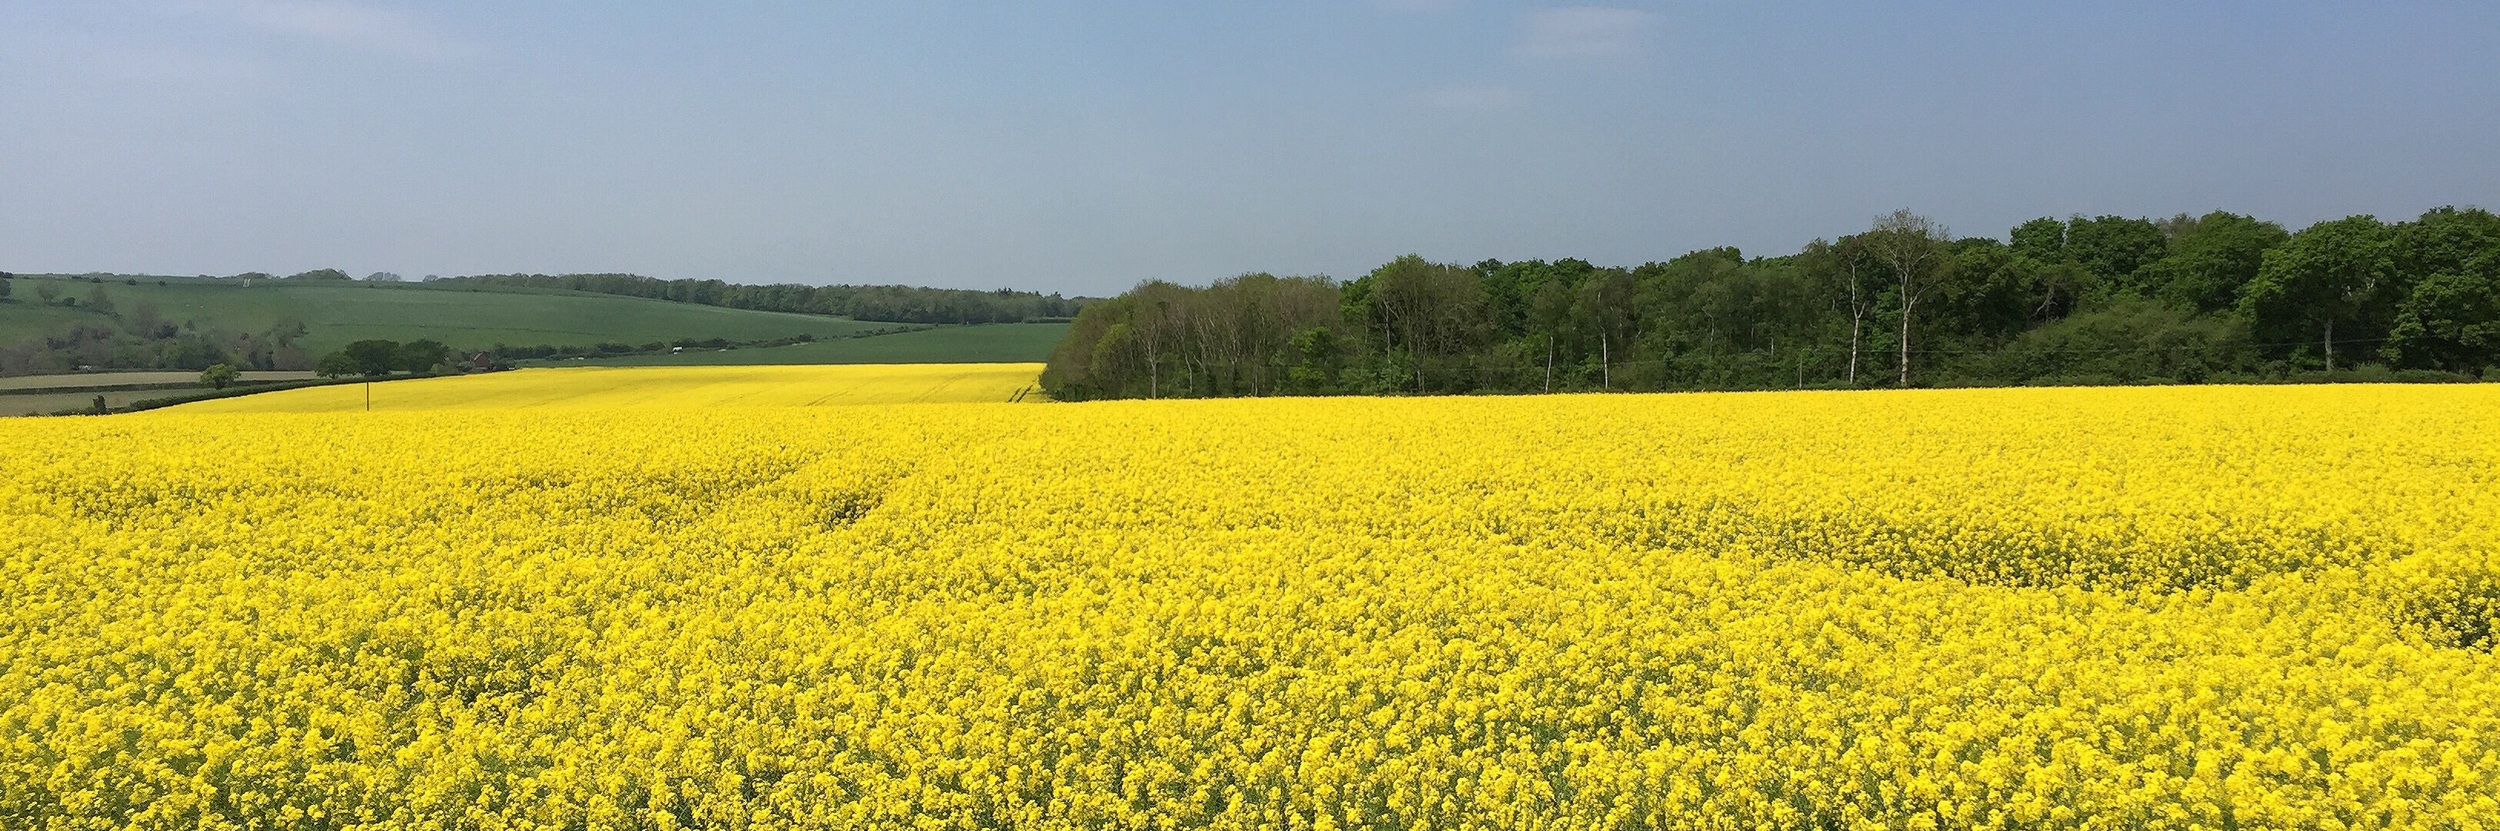 Yellow field by Hampshire Photographer Rick McEvoy